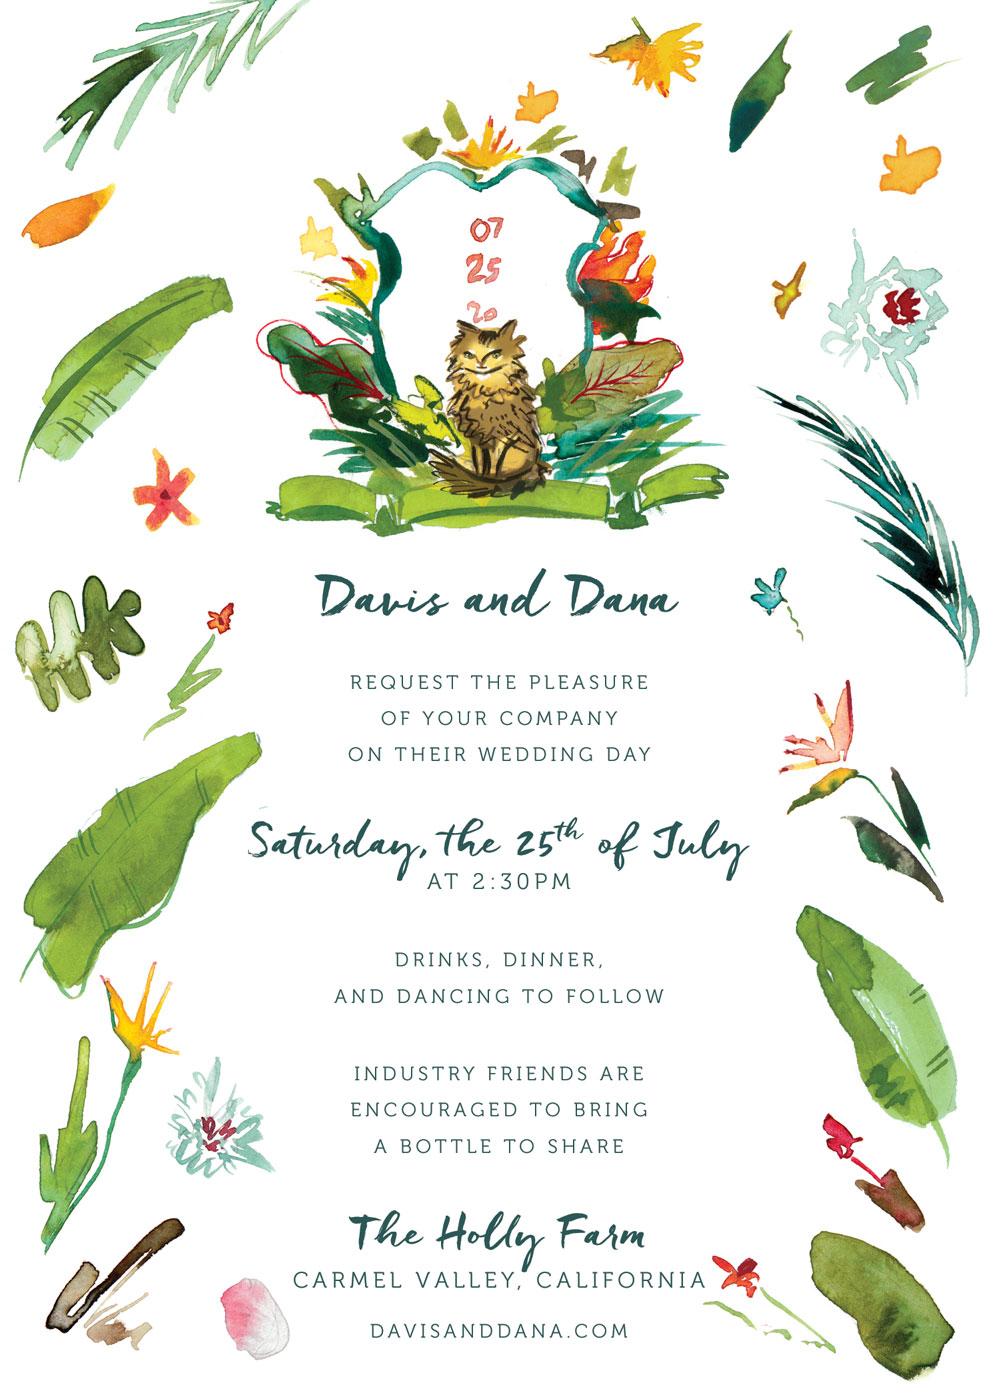 carmel-valley-california-wedding-invitation